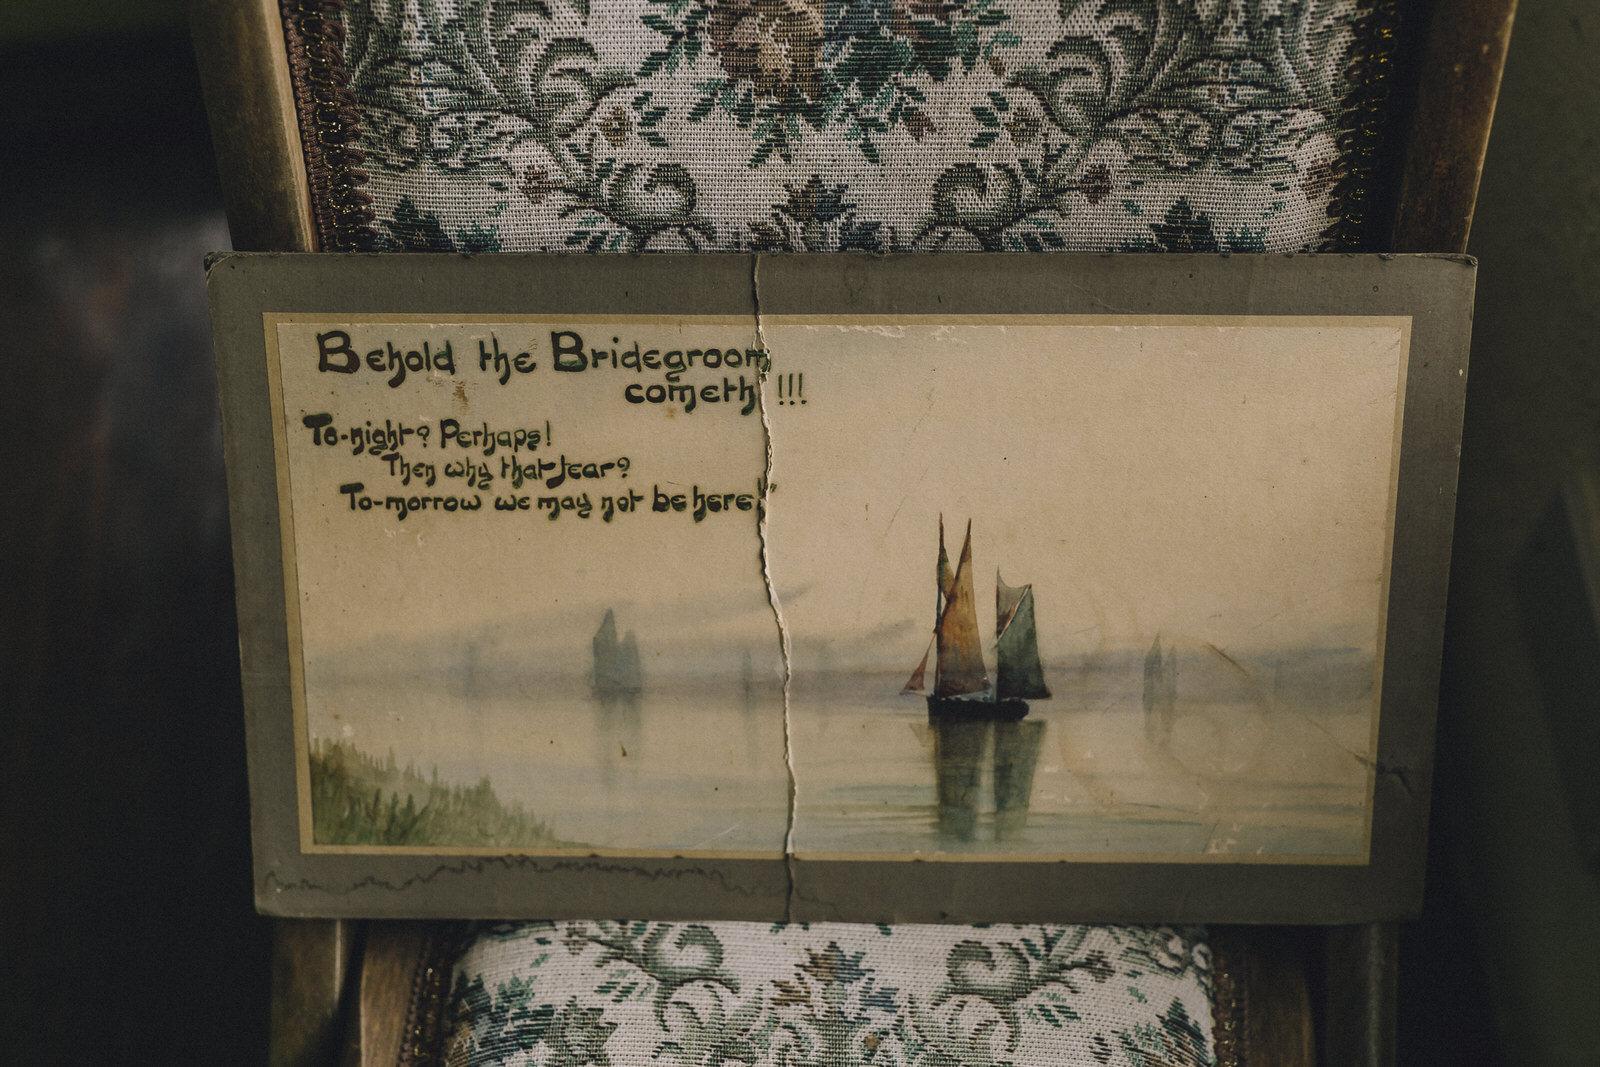 Balybeg-house-ireland-wicklow-wedding-photographer-roger-kenny_greystones022.jpg